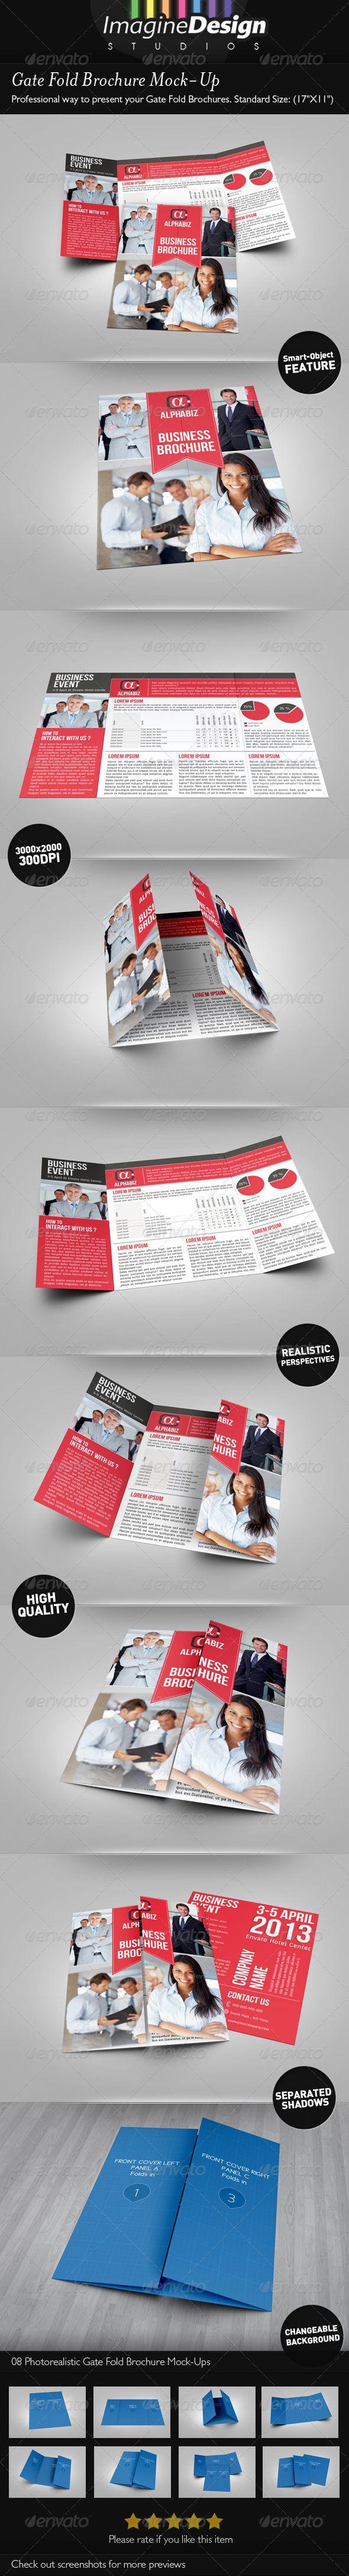 Gate Fold Brochure MockUp – Gate Fold Brochure Mockup